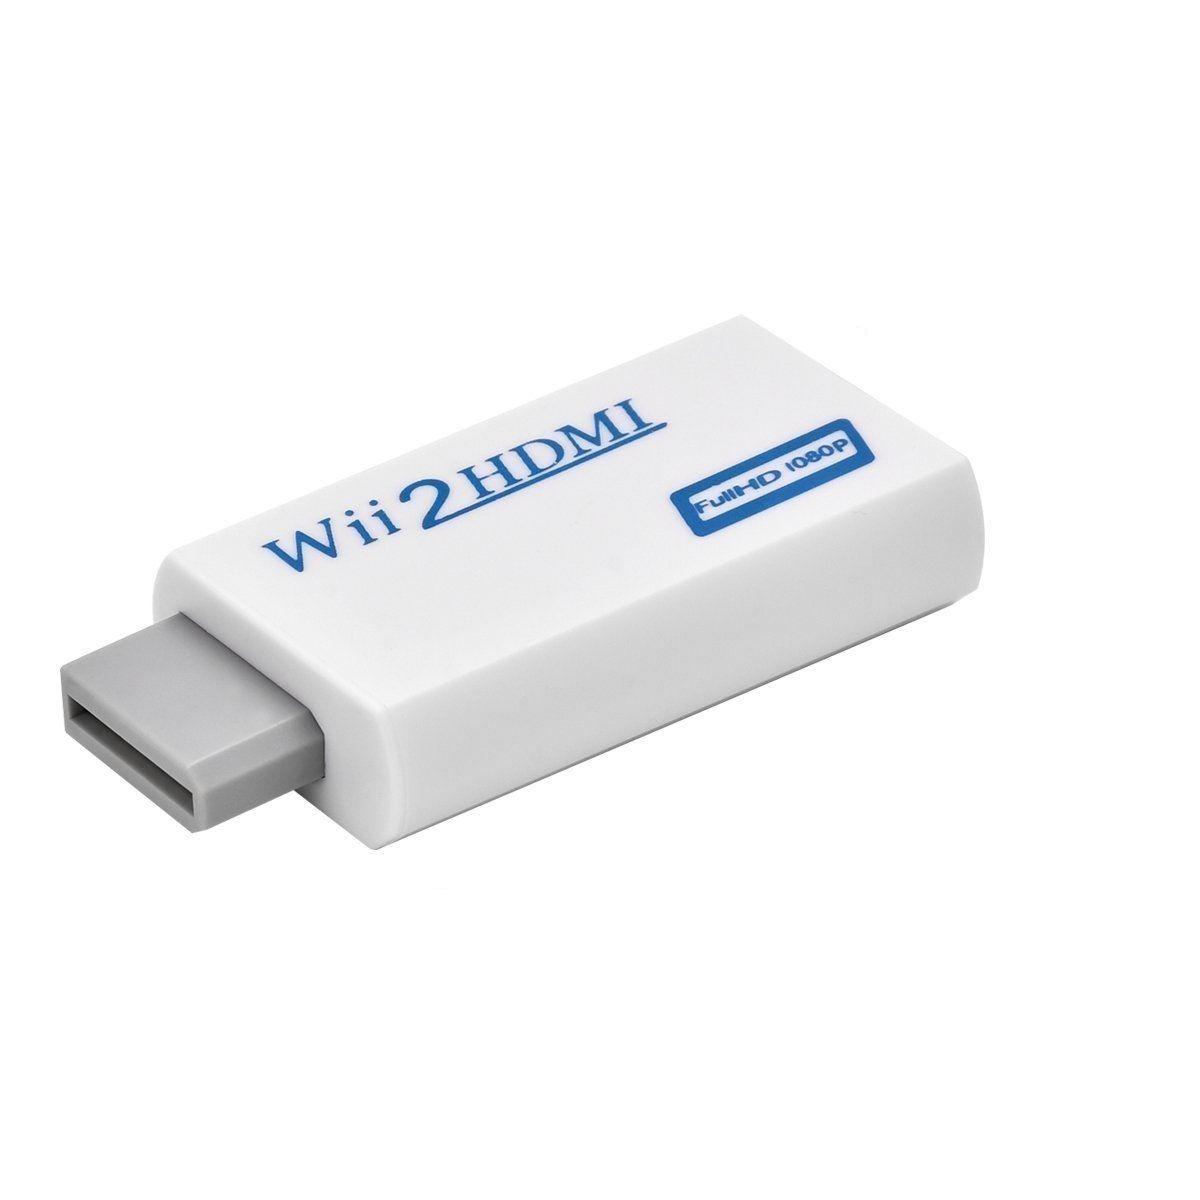 Wii Nintendo Adaptér Adaptér na HDMI + AUDIO